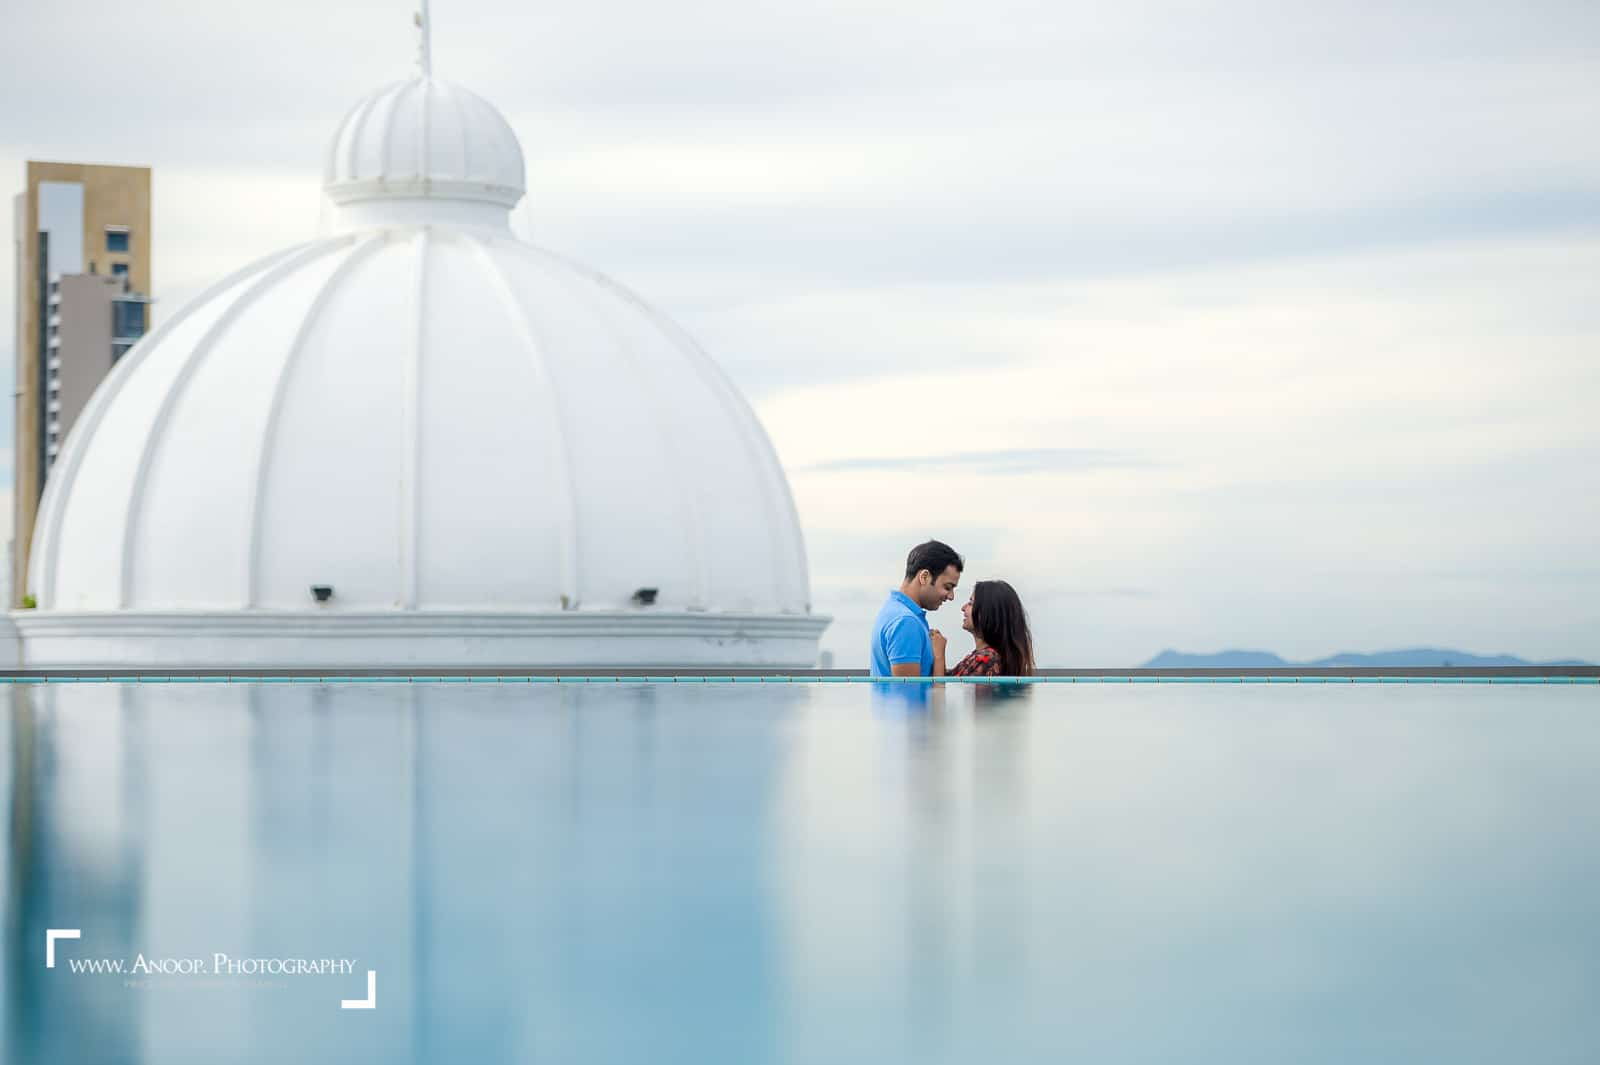 indian-Pre-Wedding-photographer-pattaya-thailand-001